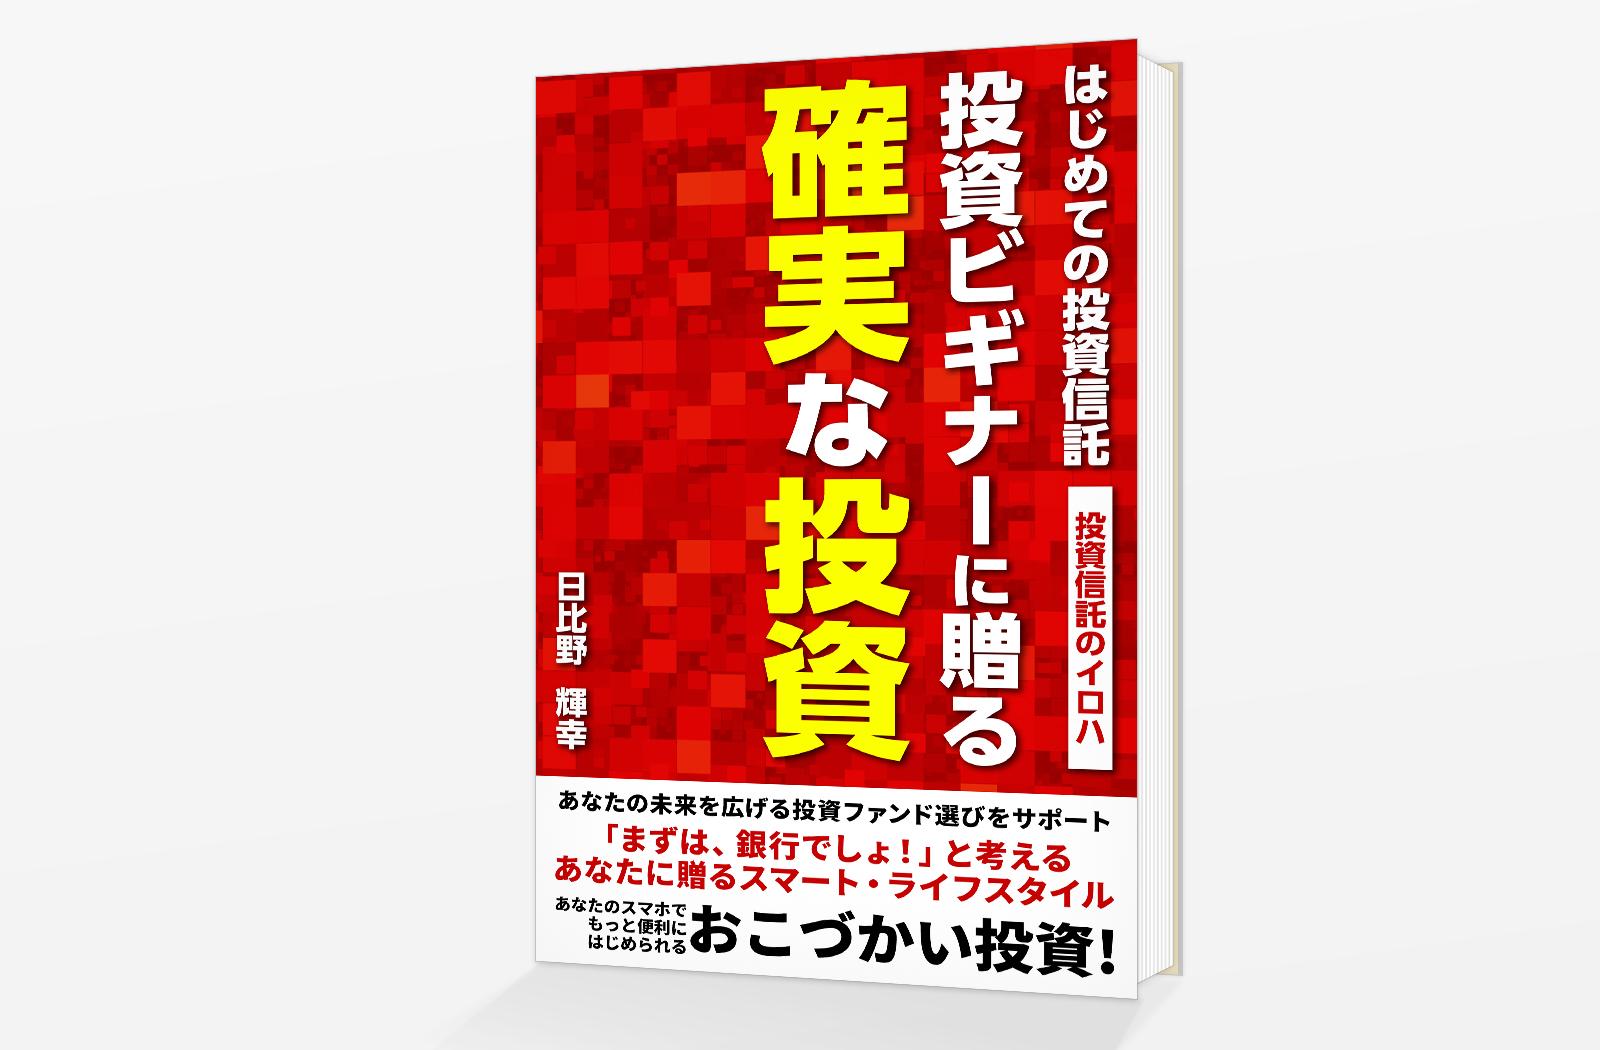 Kindle電子書籍「投資ビギナーに贈る 確実な投資: はじめての投資信託~投資信託のイロハ~」の表紙デザイン